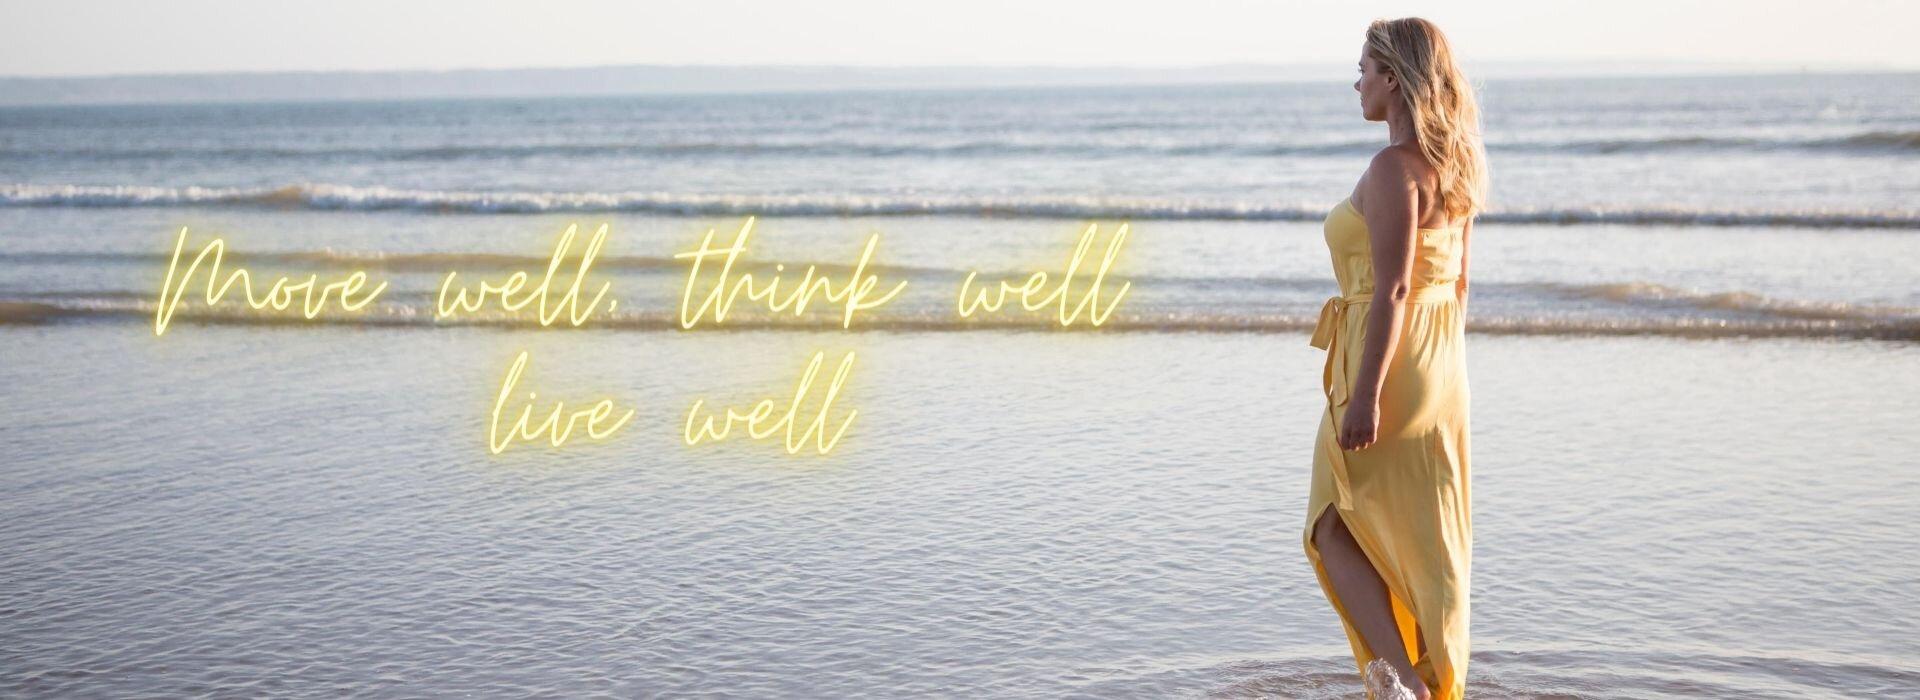 Seagrass Wellness Clases Yoga Pilates Braunton North Devon